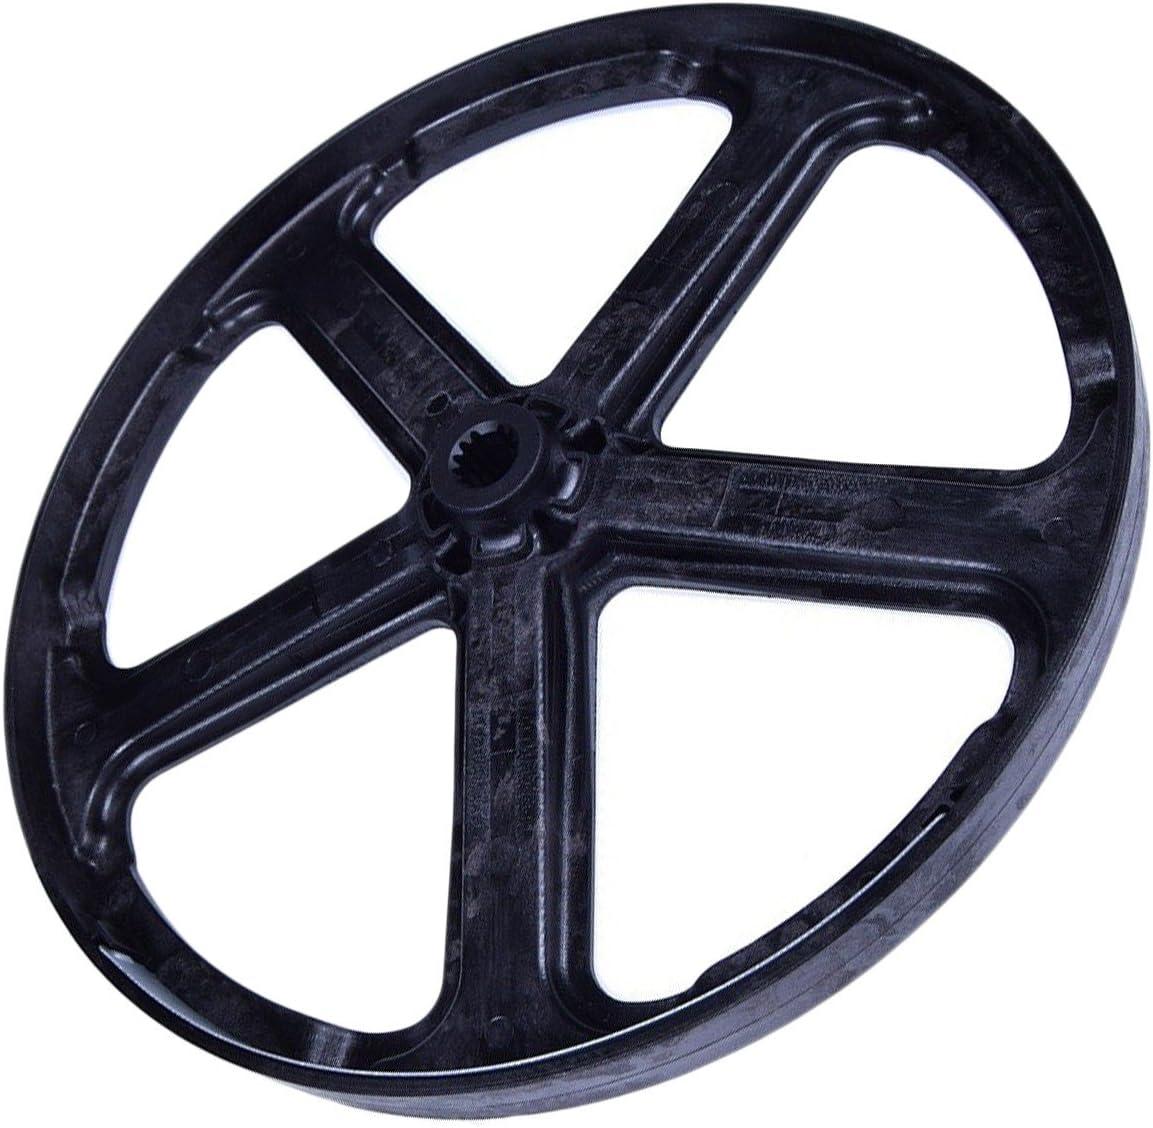 Polea de plástico – Lavadora – Electroluxx, Faure, AEG, Curtics, Arthur Martin Electrolux Horn, Zanussi.